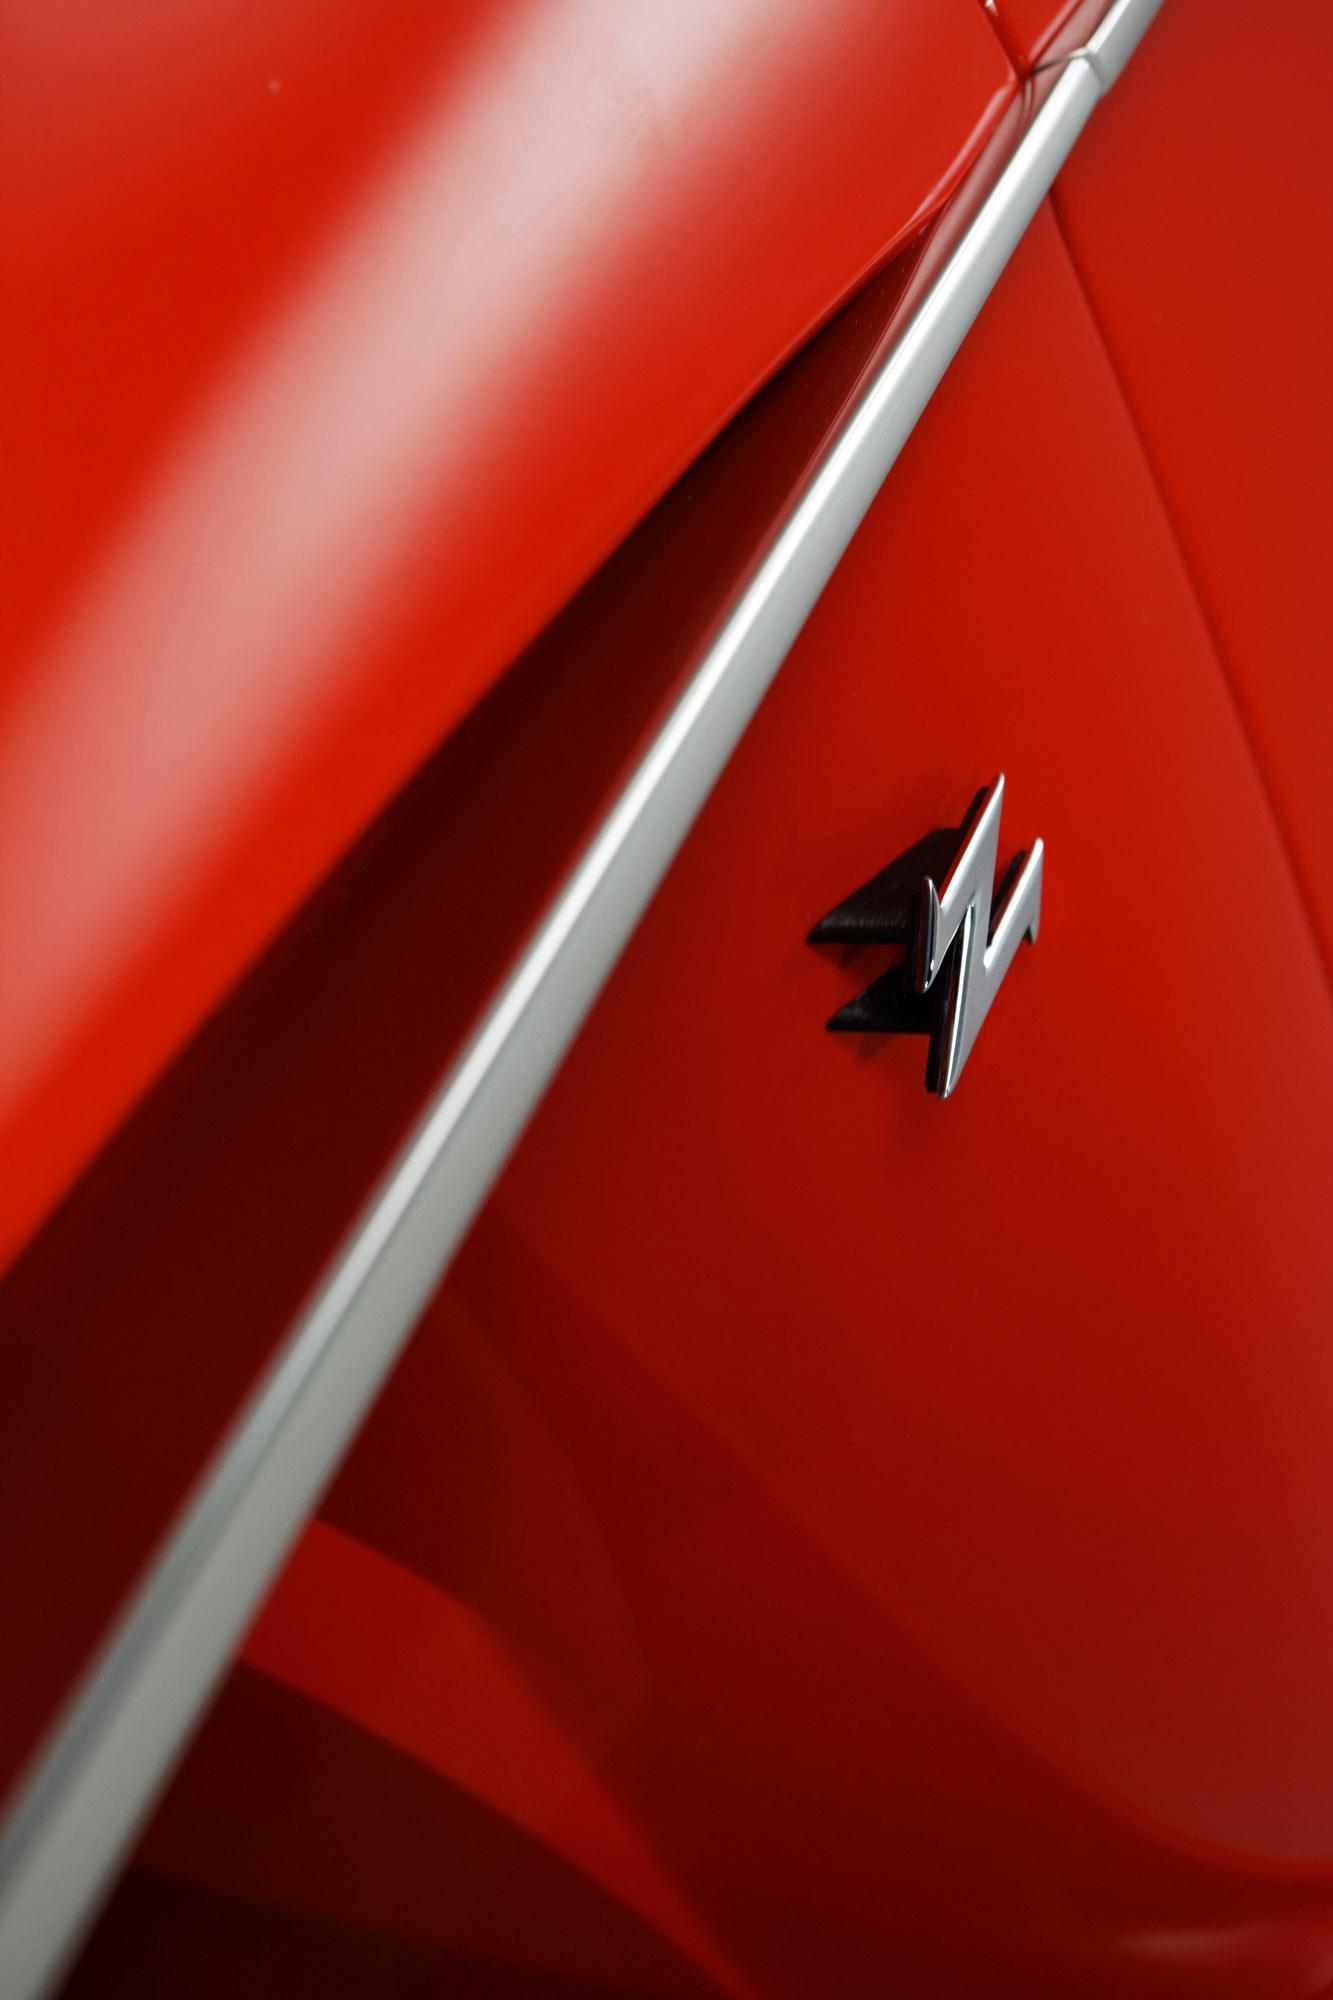 2011 Aston Martin V12 Zagato - фотография №4